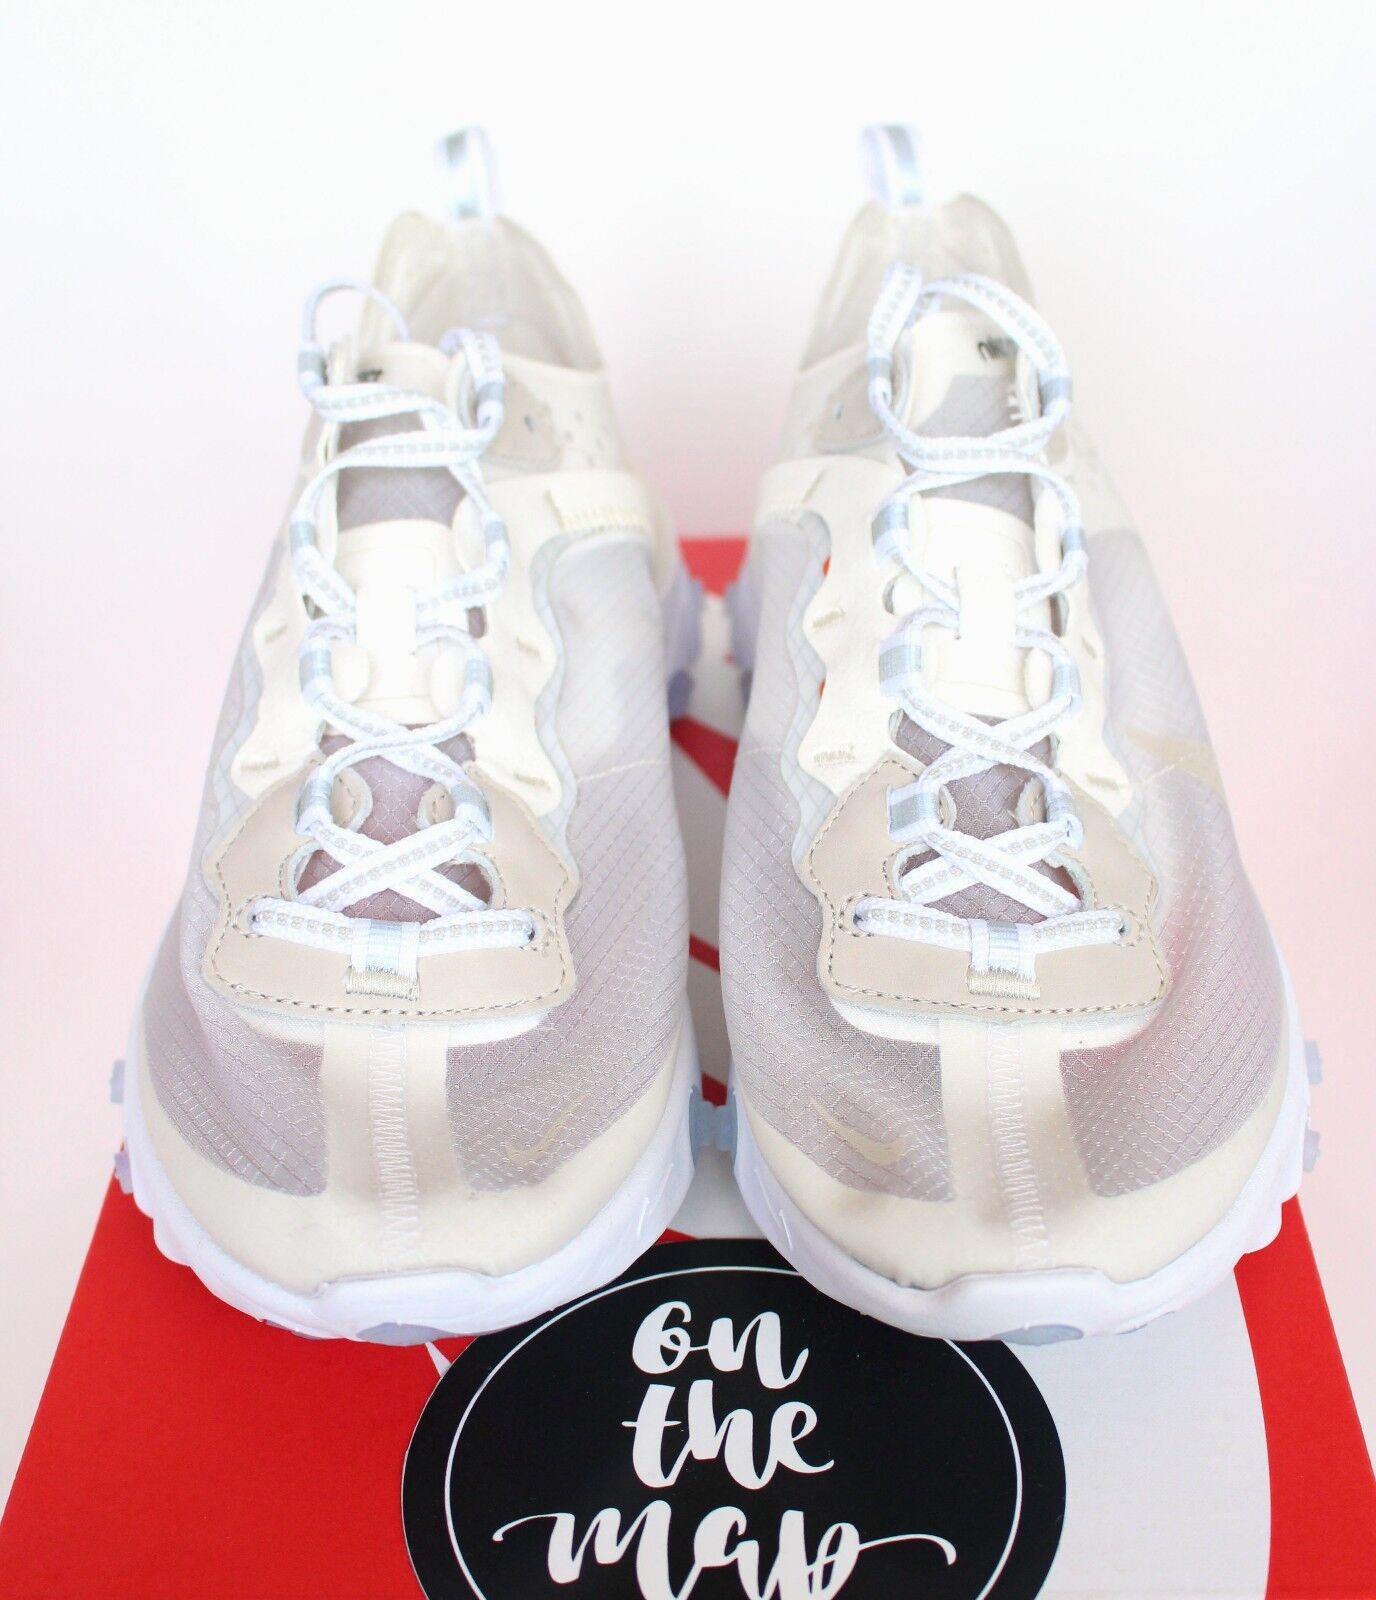 Nike reagire elemento 87 VELA VELA VELA BIANCO OSSO AQ1090-100 nuovi Stati Uniti | Grande vendita  | Uomo/Donne Scarpa  ca225f